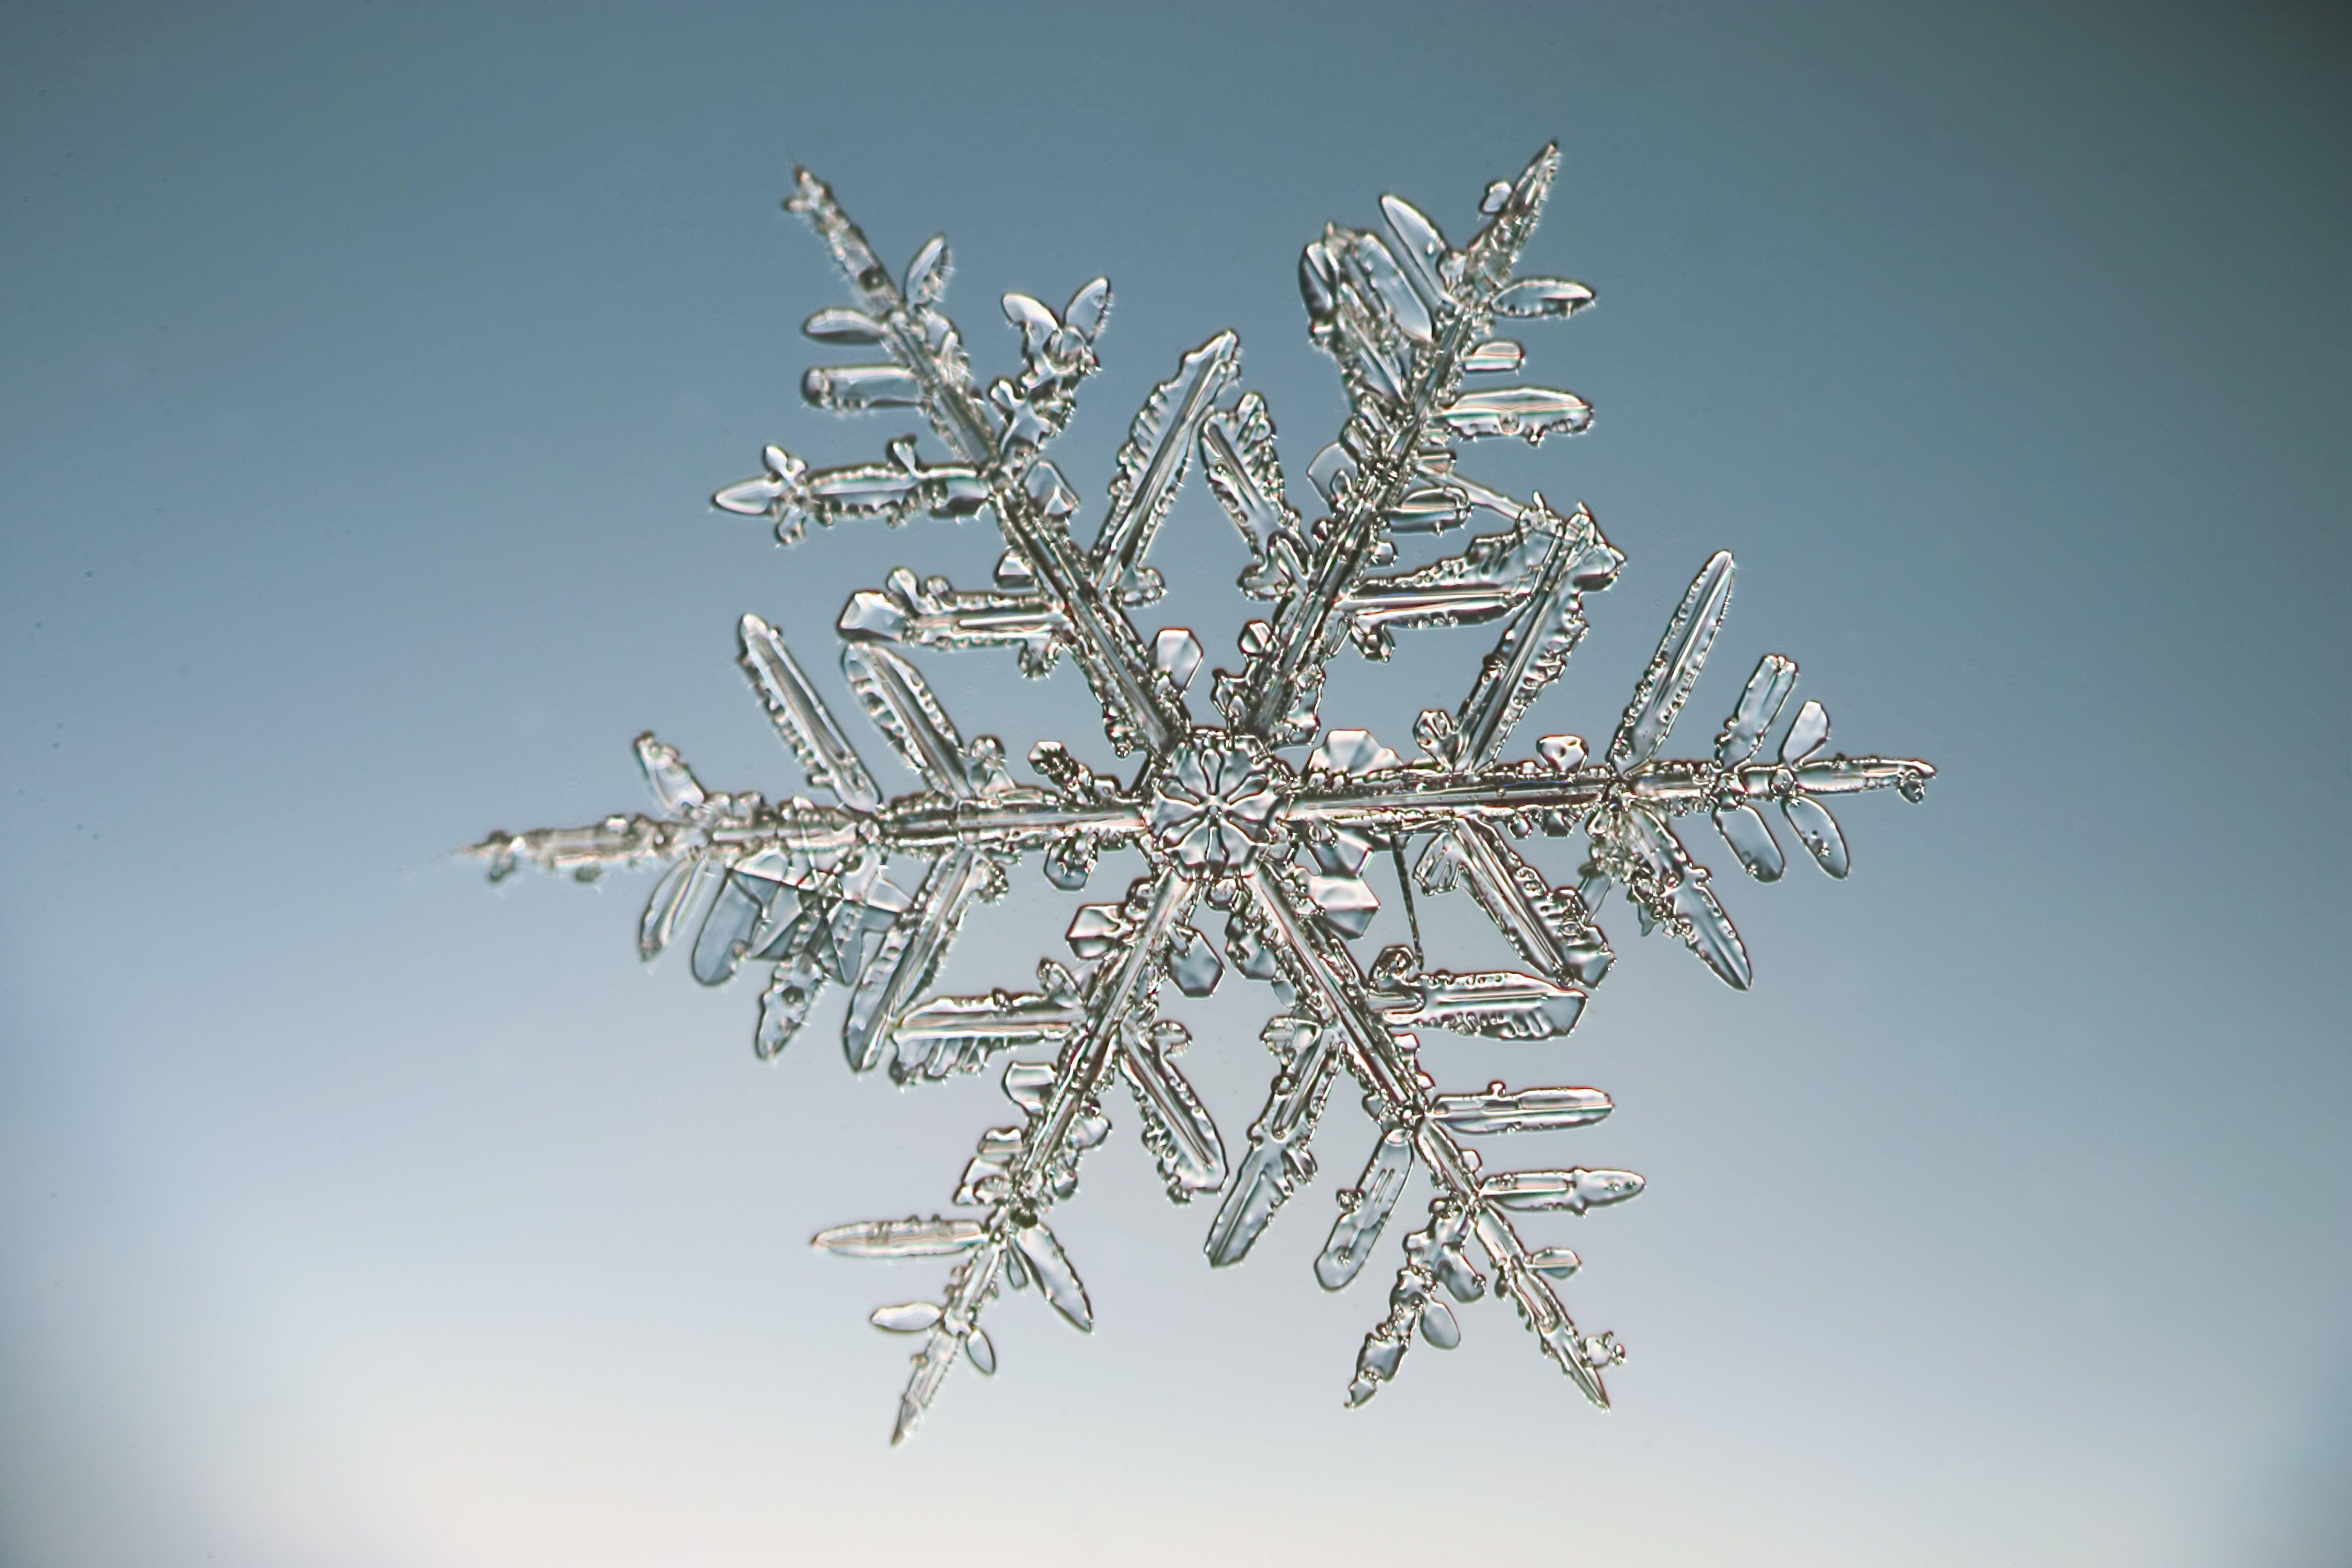 Snowflakes display hexagonal symmetry.